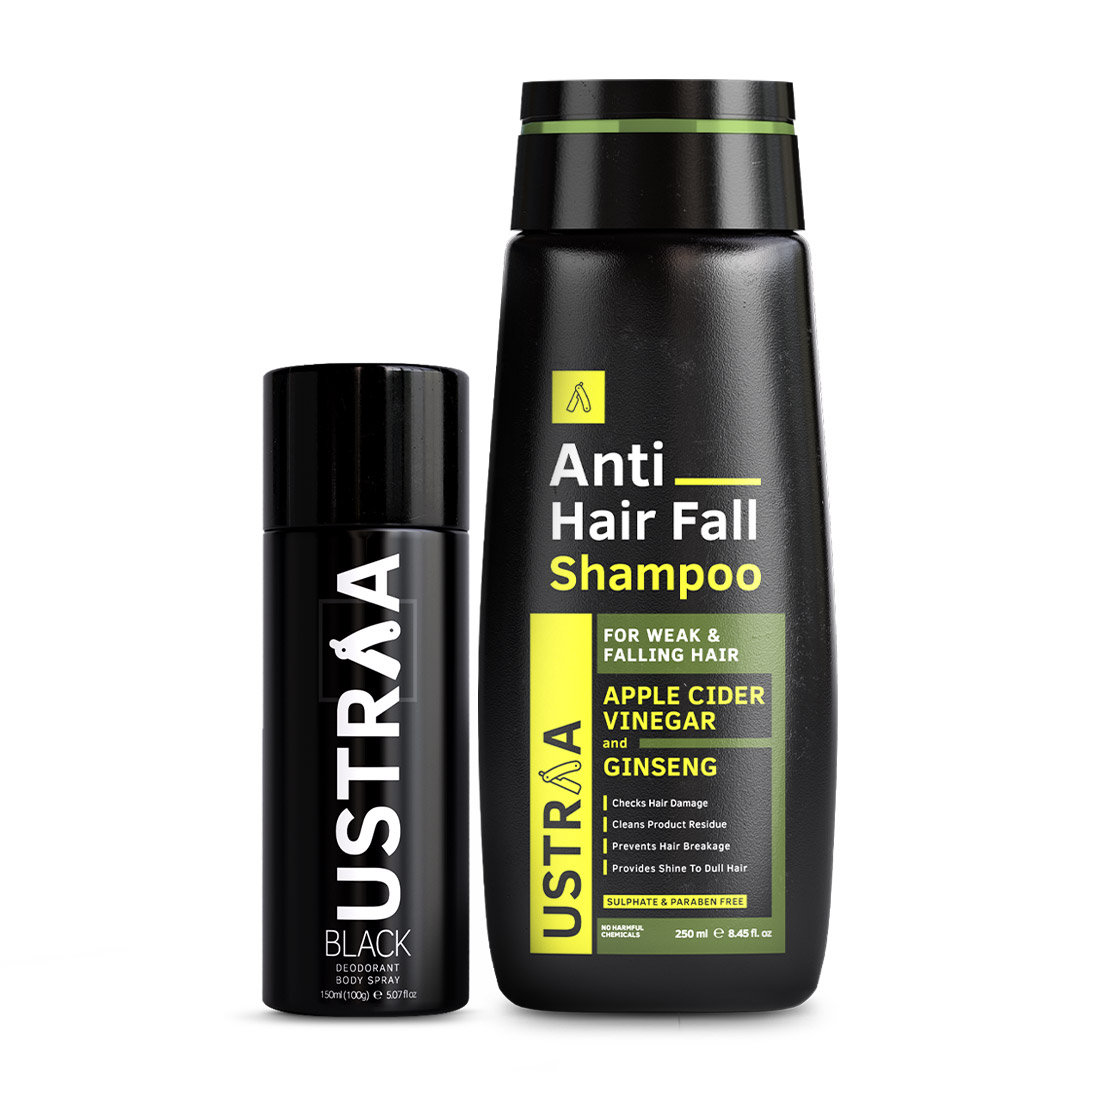 Ustraa | Ustraa Black Deodorant 150ml & Anti- Hair fall Shampoo 250ml